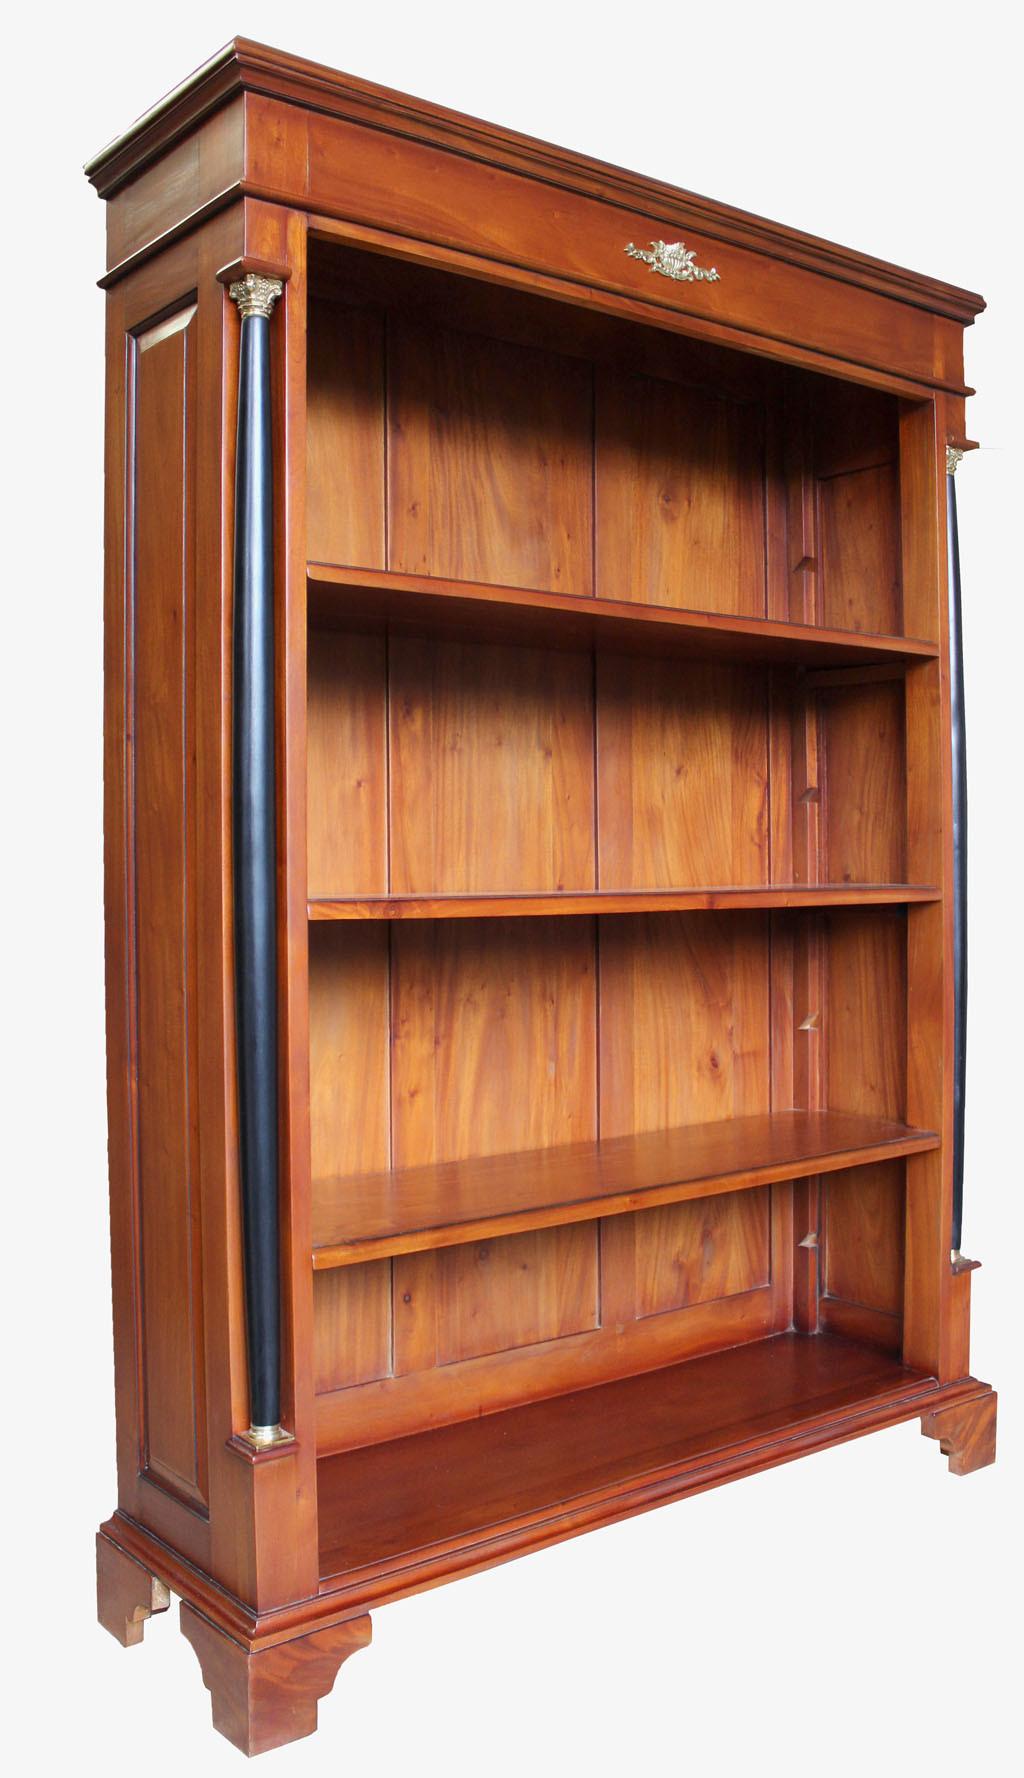 biedermeier regal kirsche m bel massiv antik. Black Bedroom Furniture Sets. Home Design Ideas